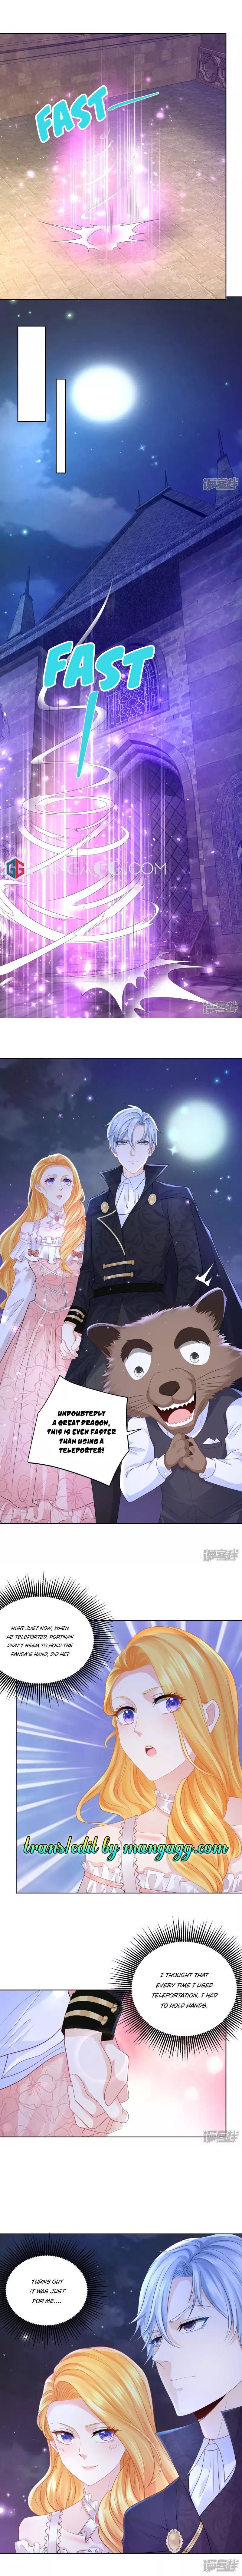 I Just Want To Be A Useless Duke's Daughter Chapter 132 page 3 - Mangakakalots.com